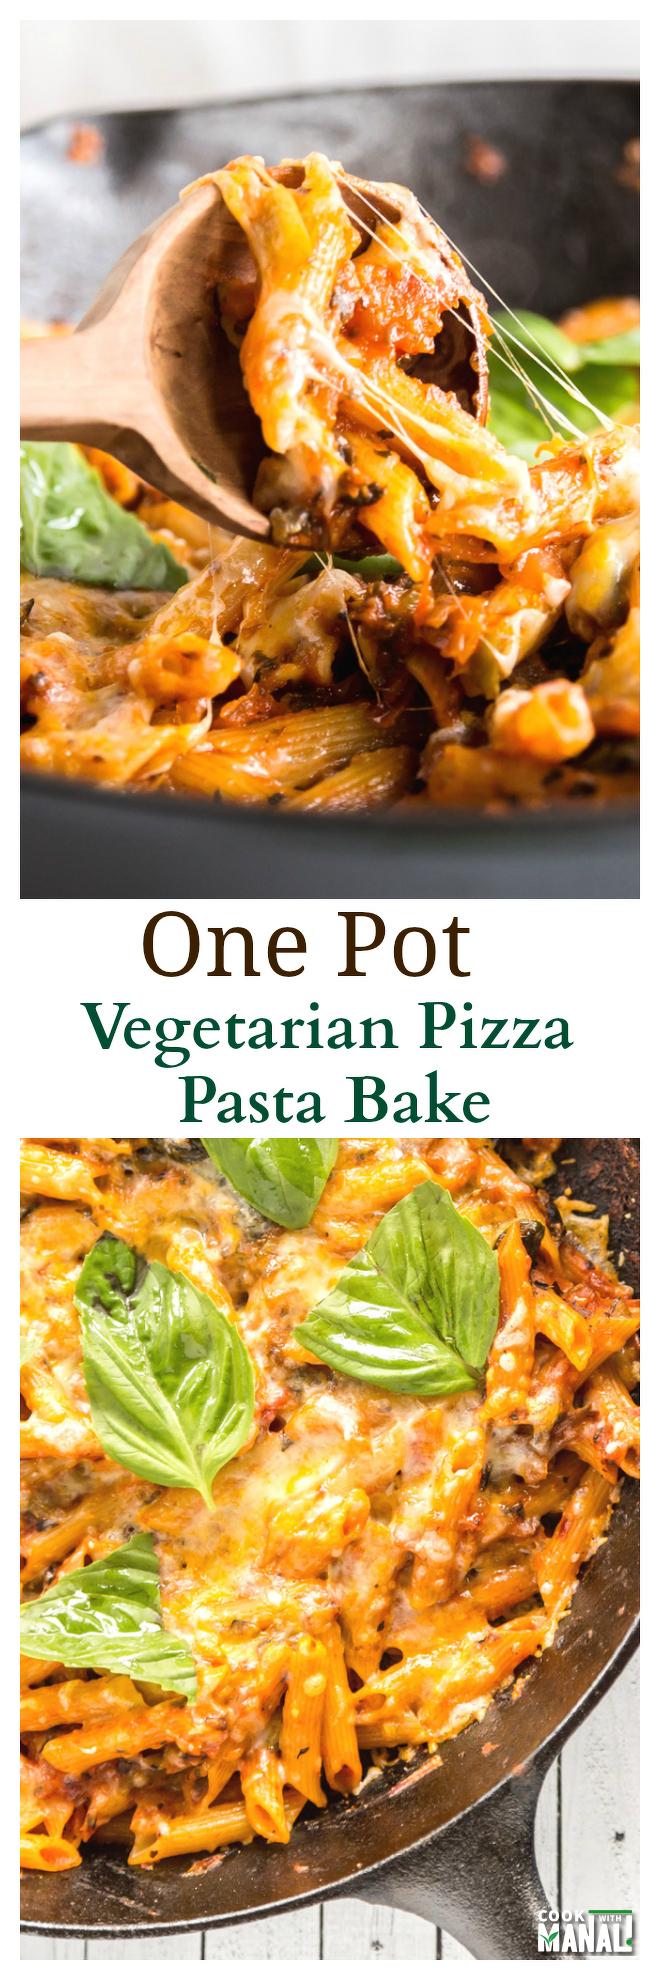 One Pot Vegetarian Pizza Pasta Bake Collage